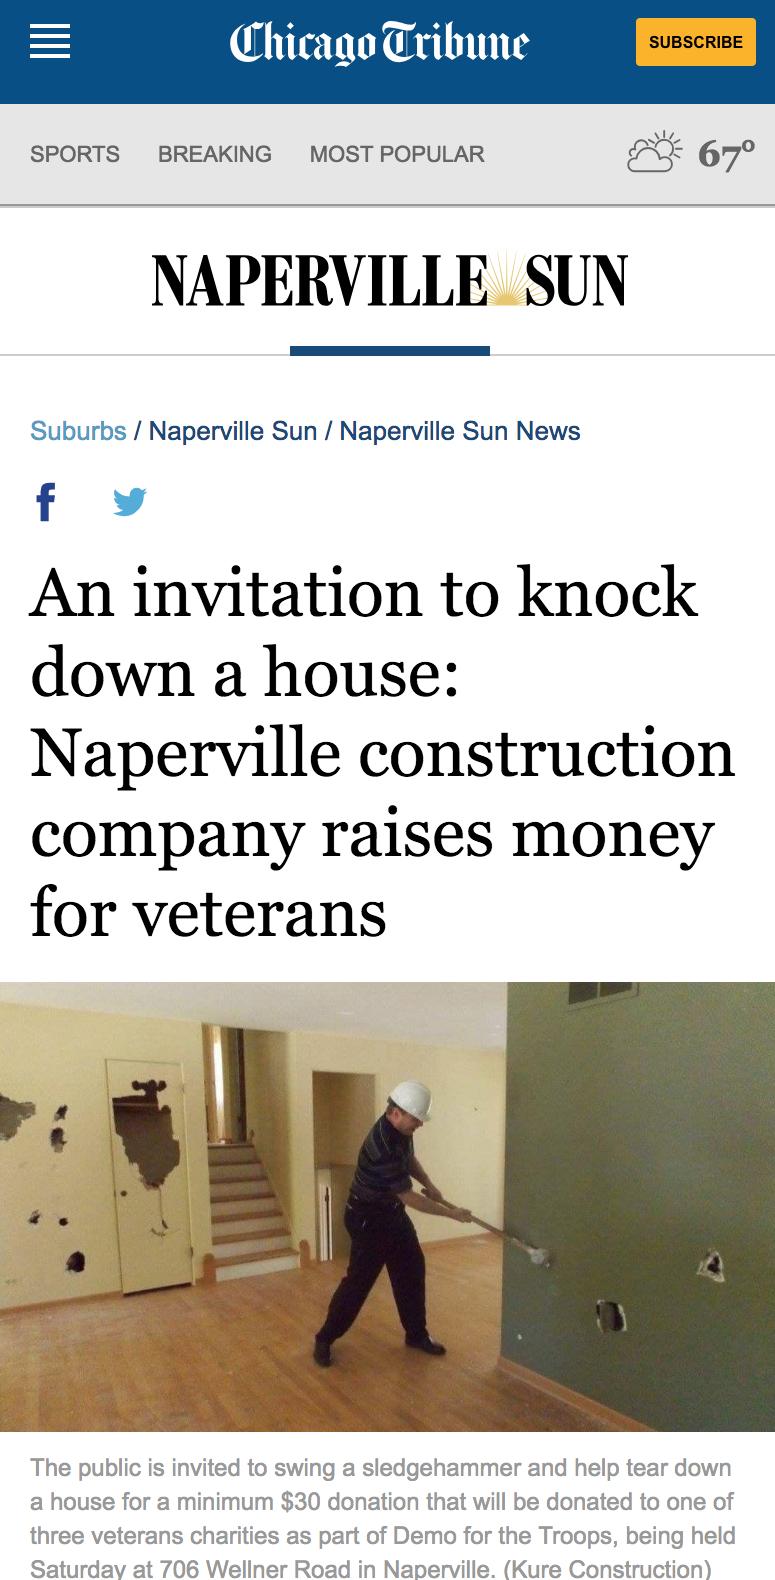 Naperville Sun Kure Construction Feature